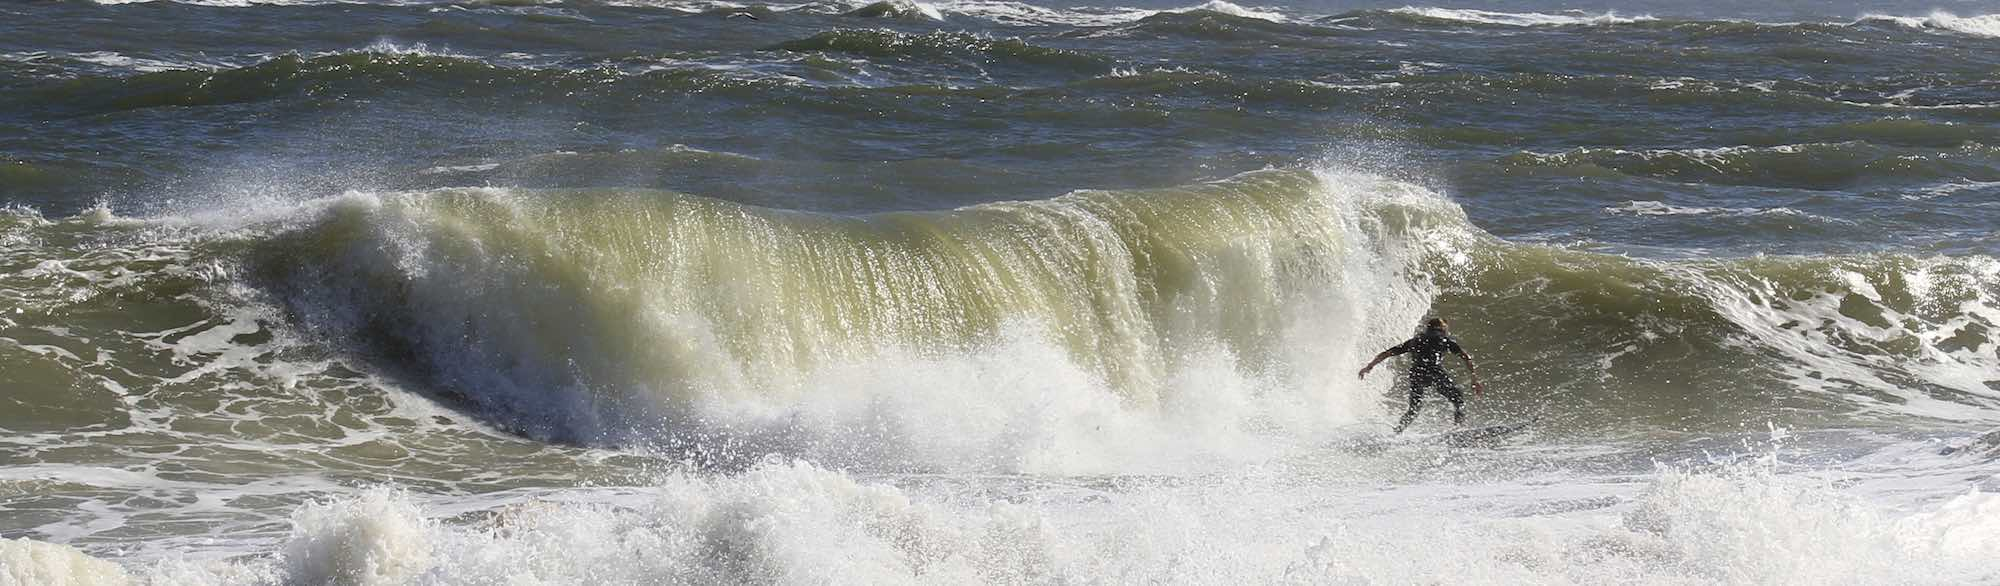 Large wave behind a surfer.